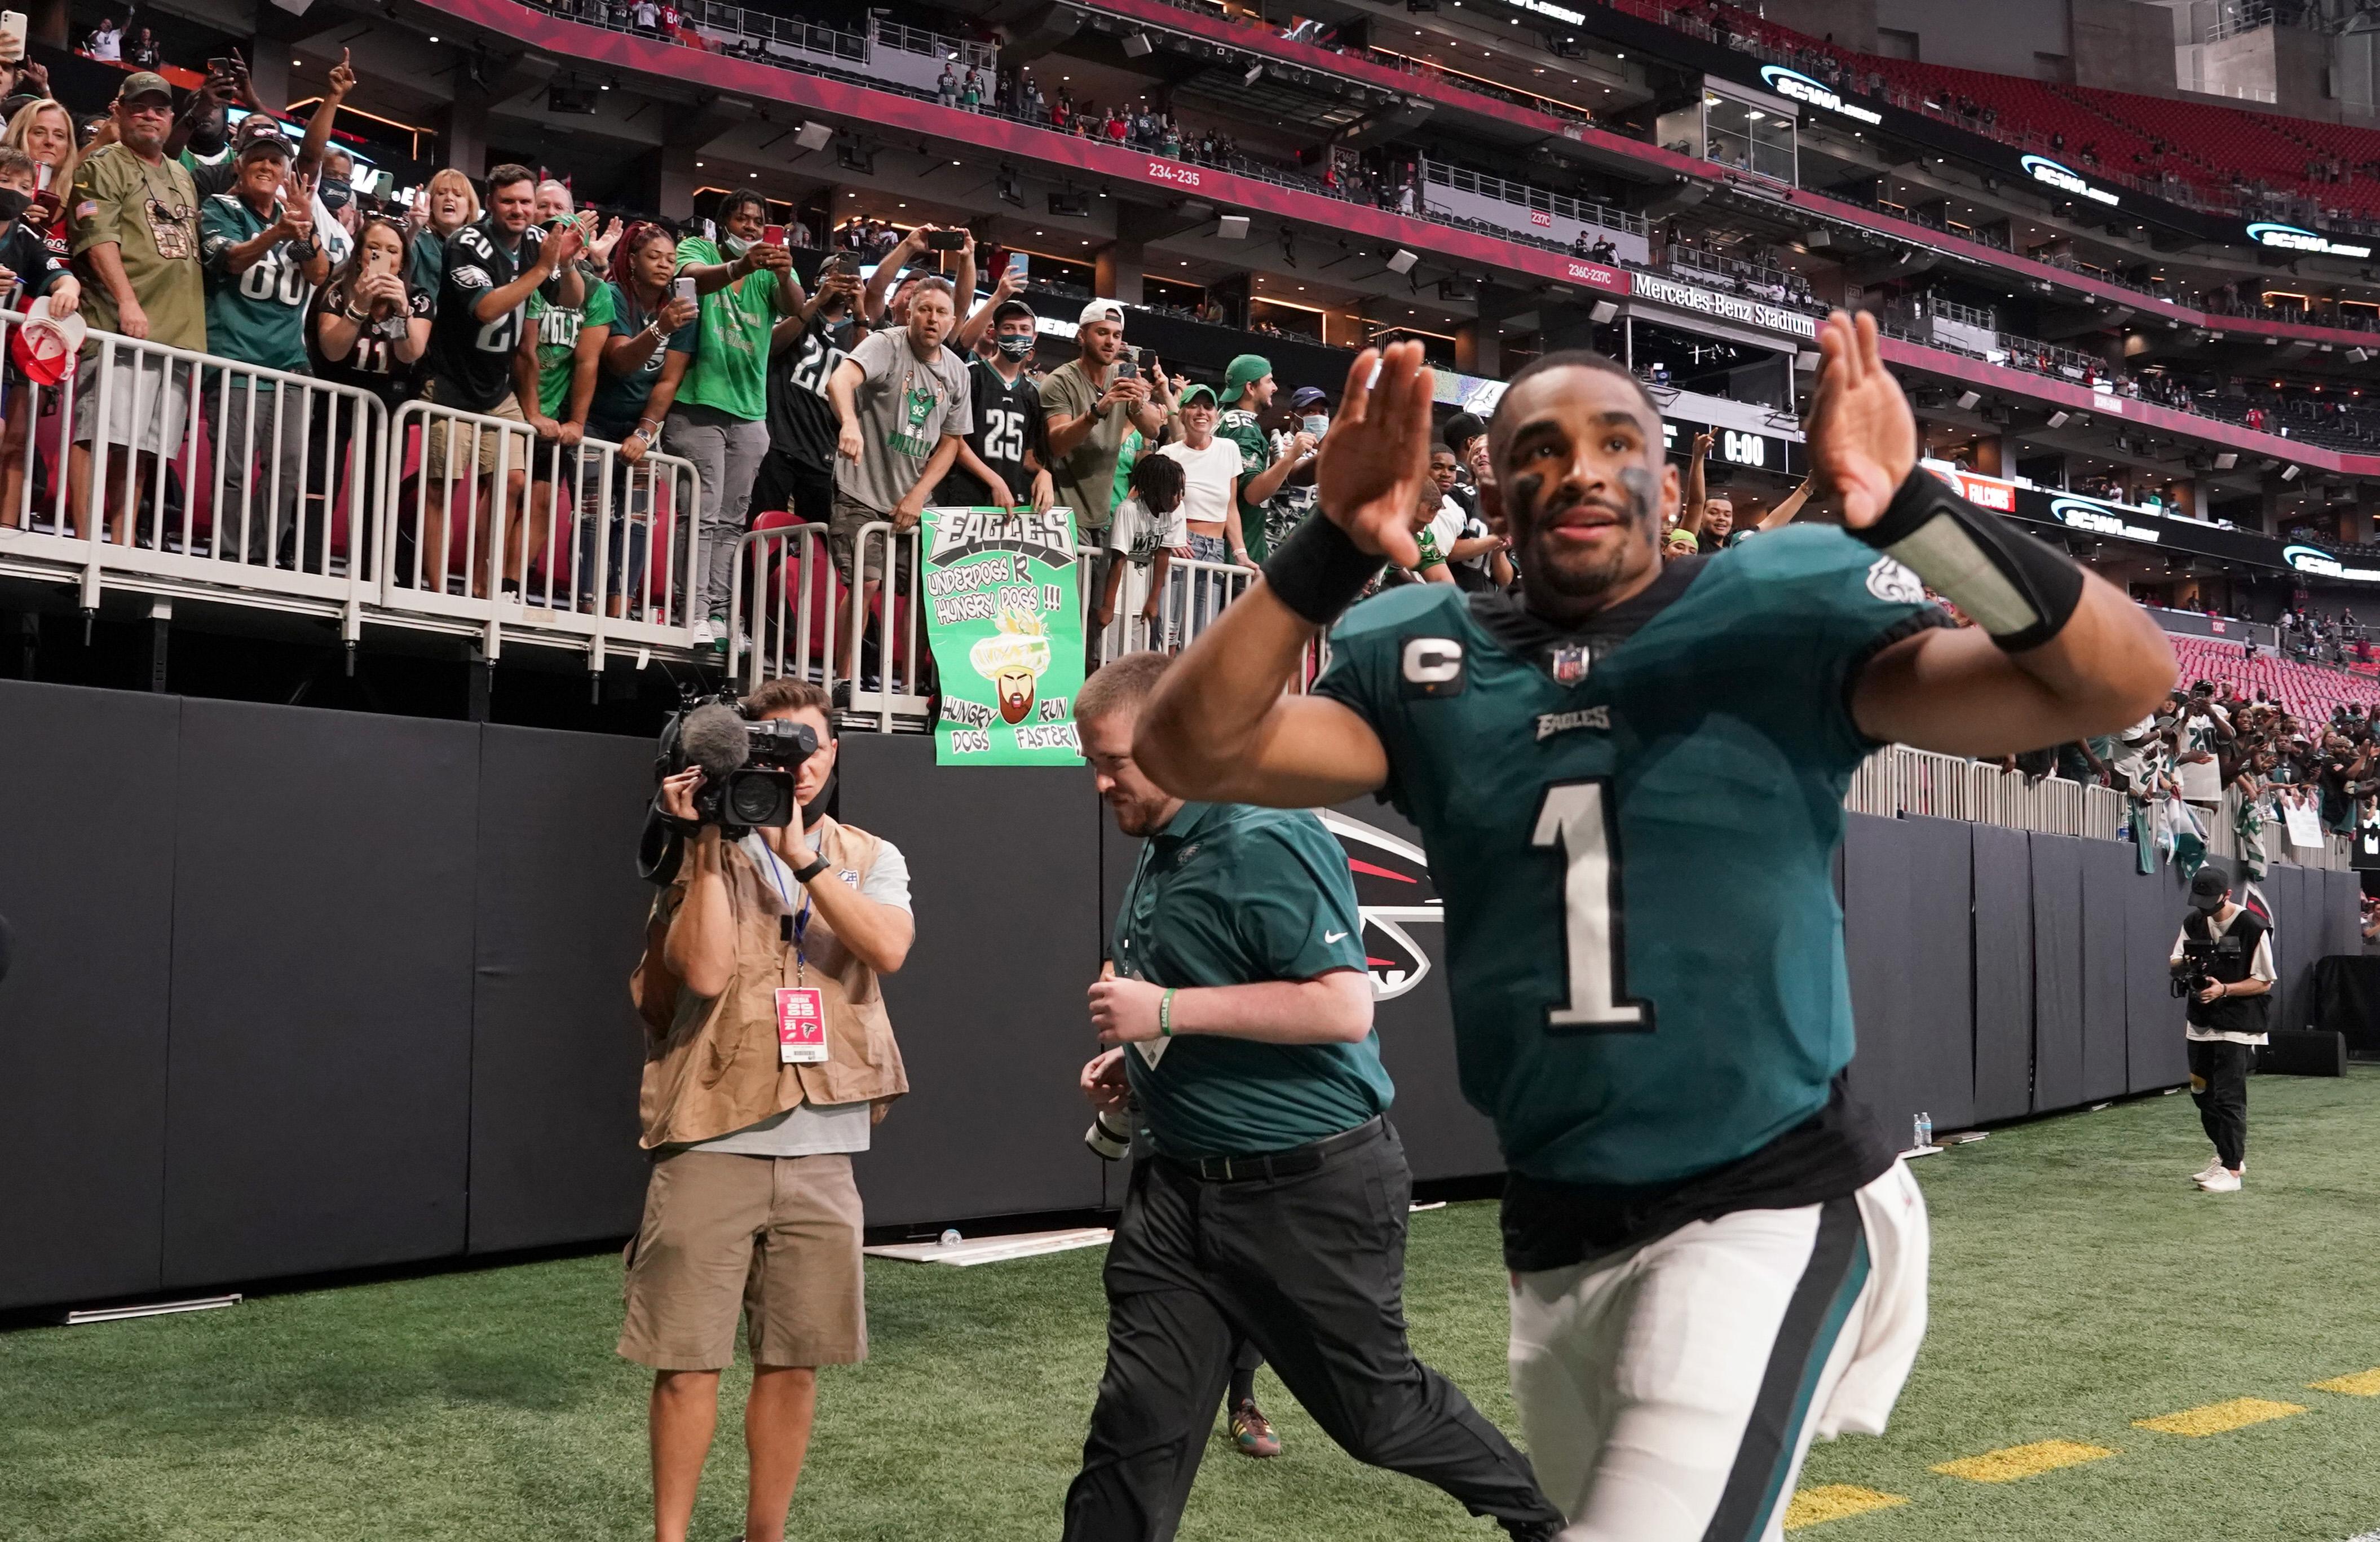 Philadelphia Eagles quarterback Jalen Hurts (1) celebrates as he runs off the field towards the Philadelphia Eagles fans after beating the Atlanta Falcons 32-6 at Mercedes-Benz Stadium.